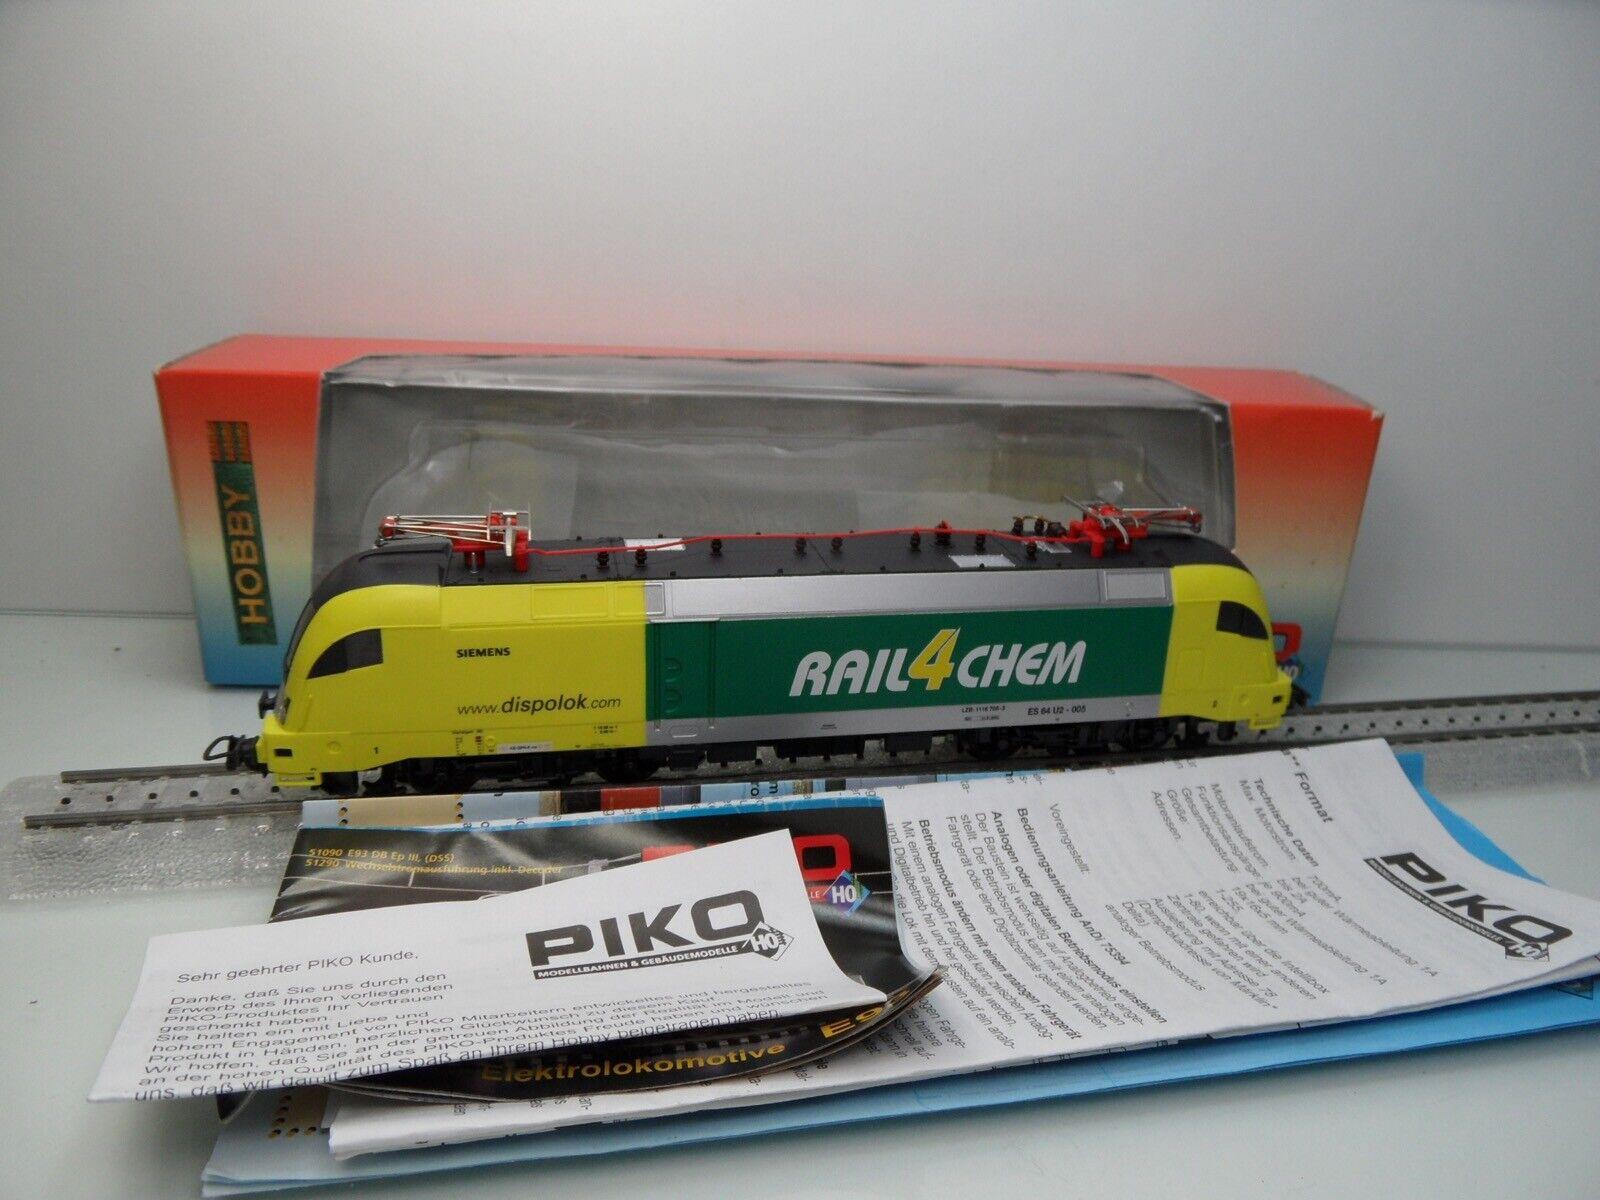 Piko 57219 - H0 - Dispolok - SIEMENS - RAIL4CHEM - AC / Digital -TOP/OVP - #4144